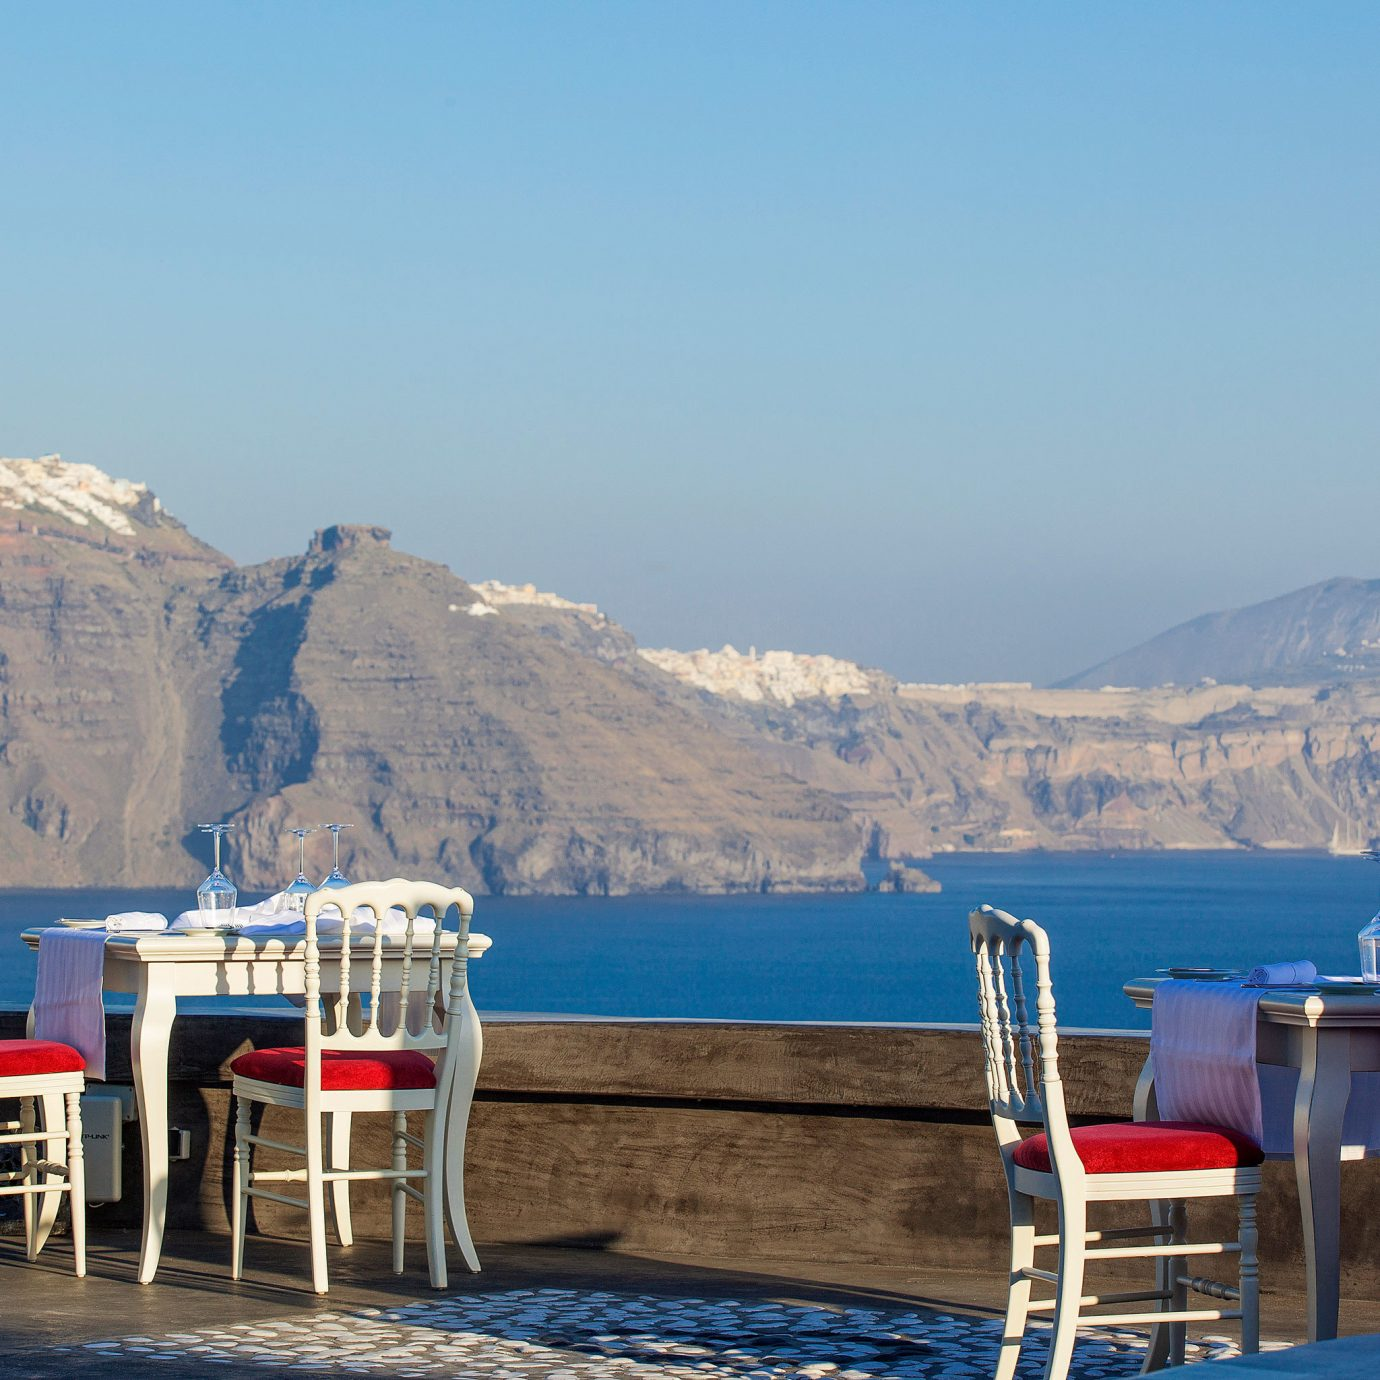 Cultural Deck Dining Drink Eat Elegant Honeymoon Island Outdoors Romance Romantic Scenic views Waterfront sky mountain chair Sea Nature vehicle Resort shore